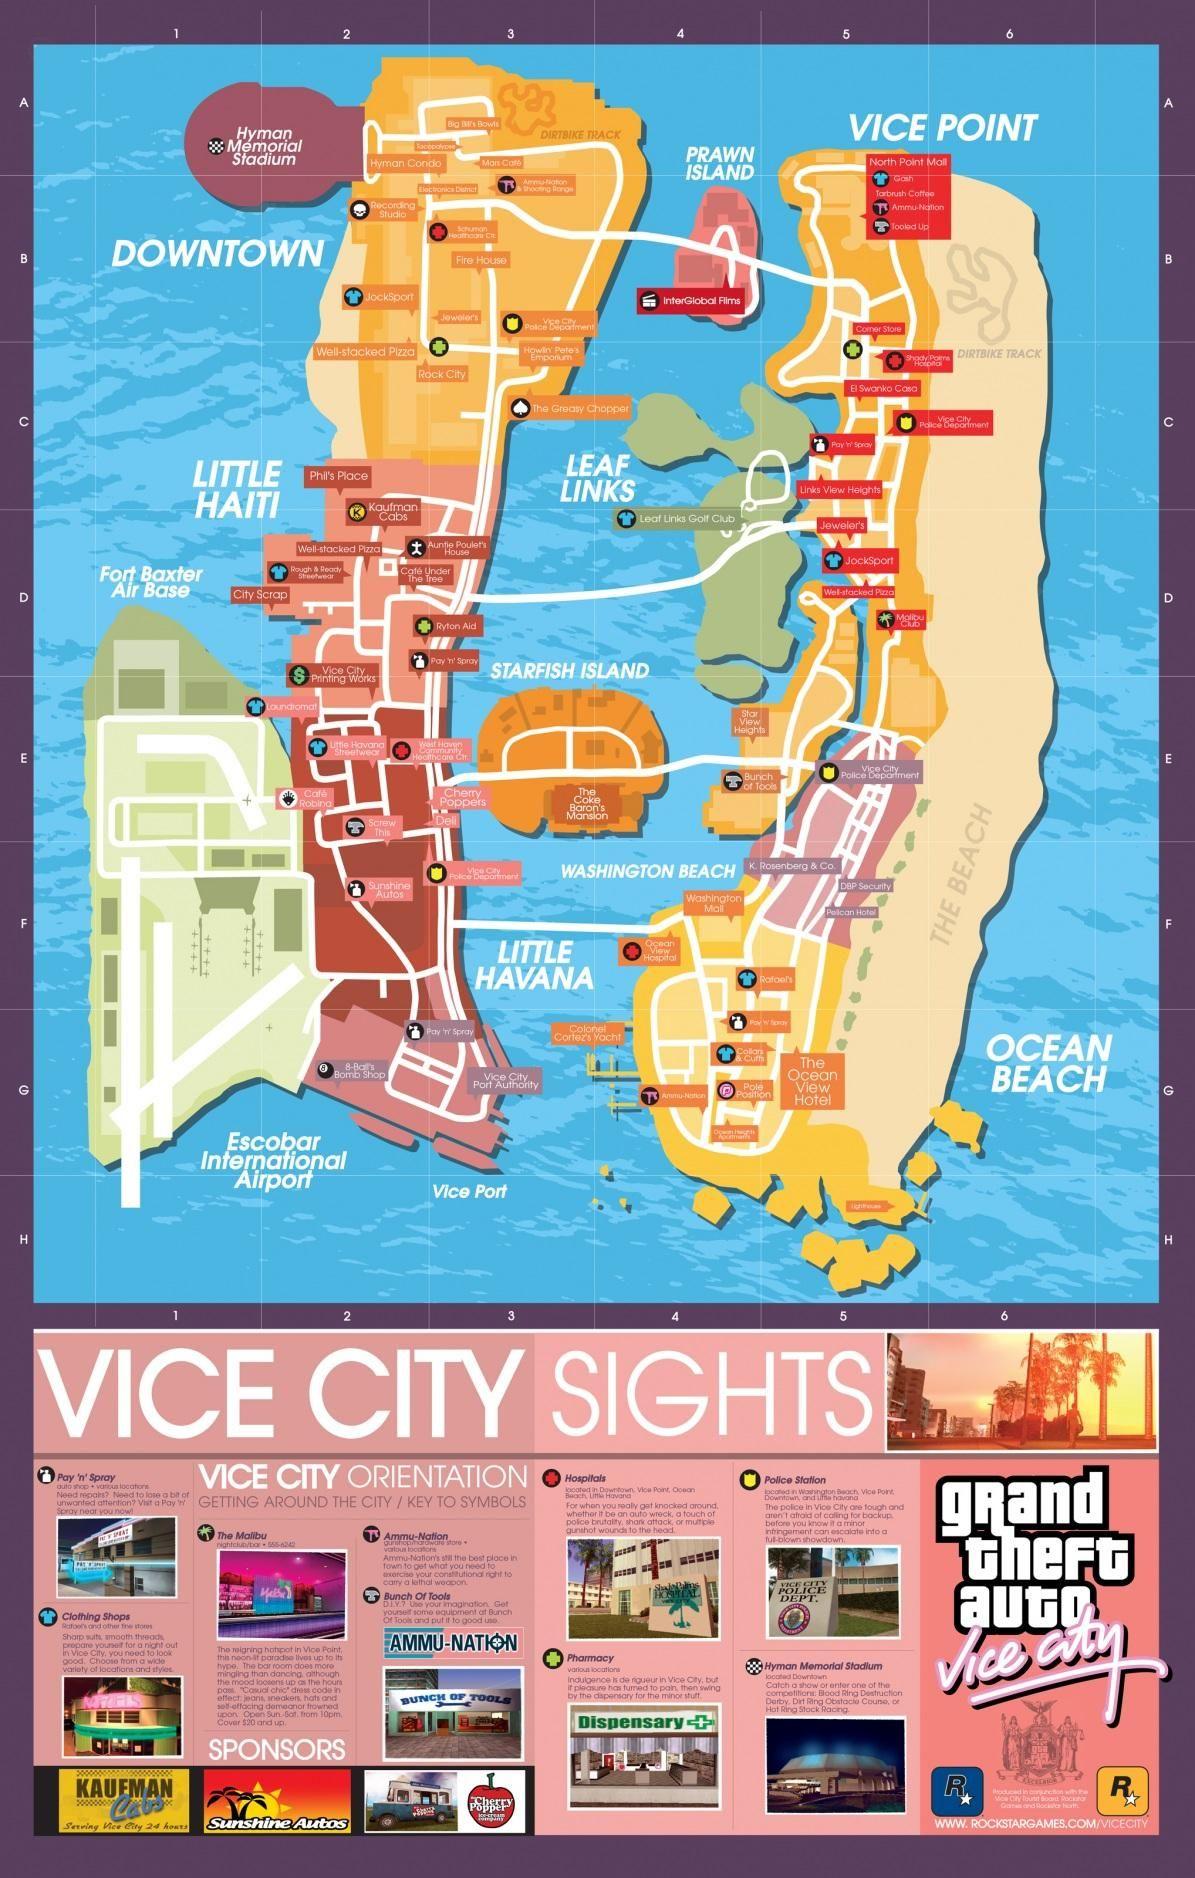 Gta Vice City Map Grand Theft Auto Grand Theft Auto Series Gta City